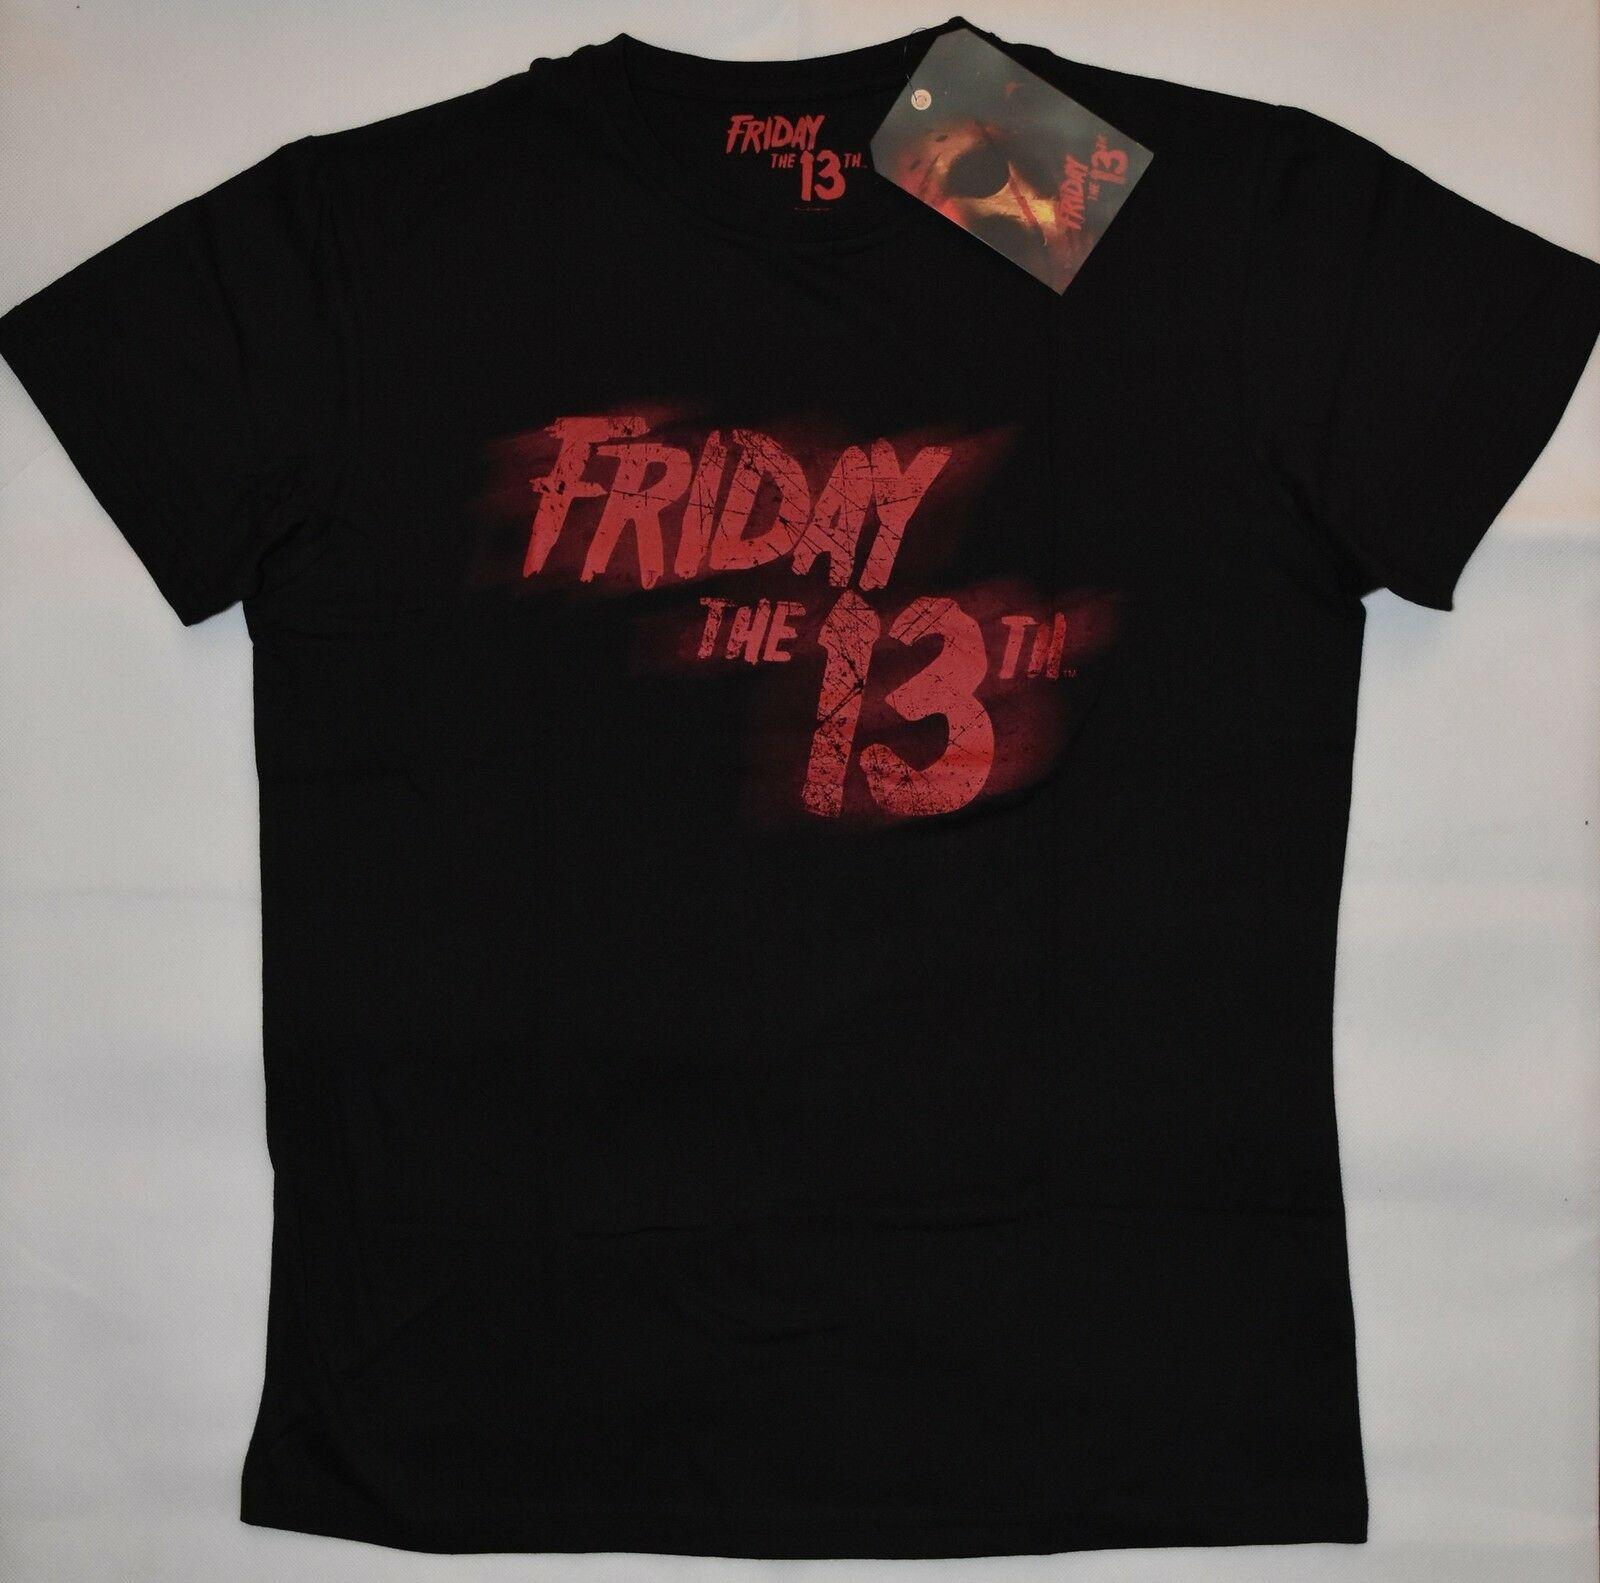 Primark Friday The 13th Mens T Shirt Black Red Horror Film New Uk Size Xl Sleeve Men T Shirt Fashion T Shirts Aliexpress